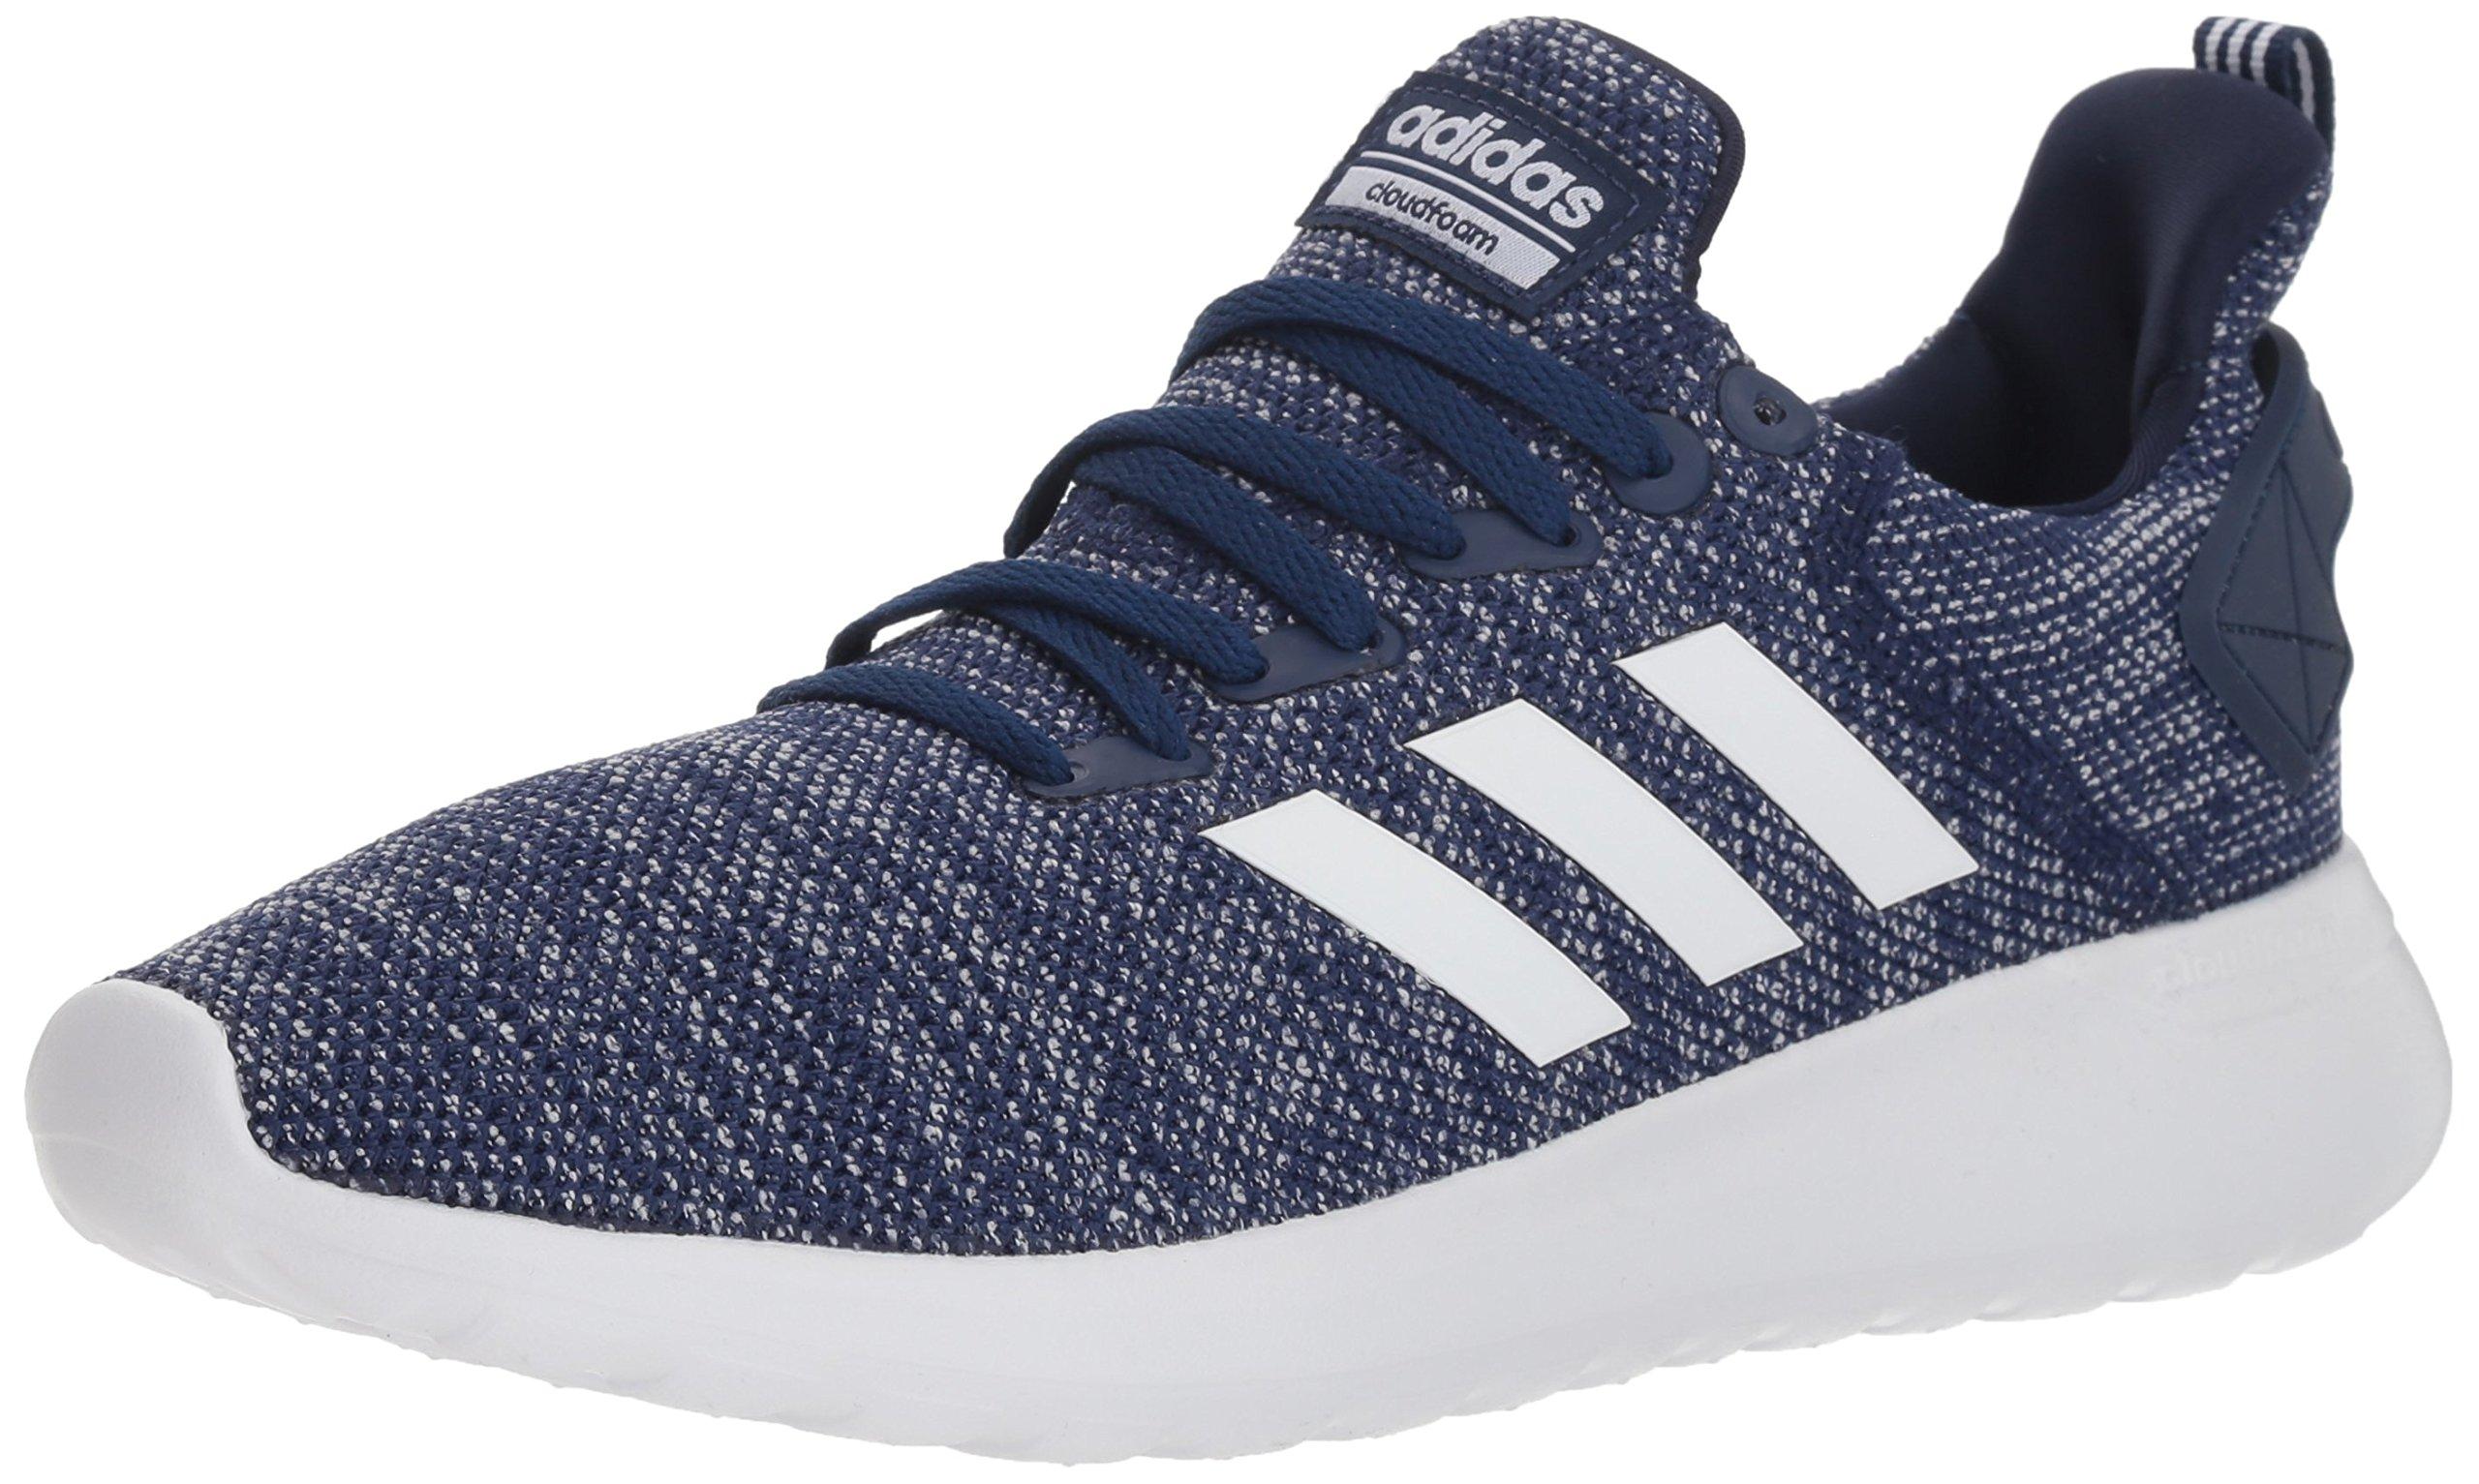 adidas Men's Lite Racer BYD Running Shoe, Dark Blue/White/White, 9 M US by adidas